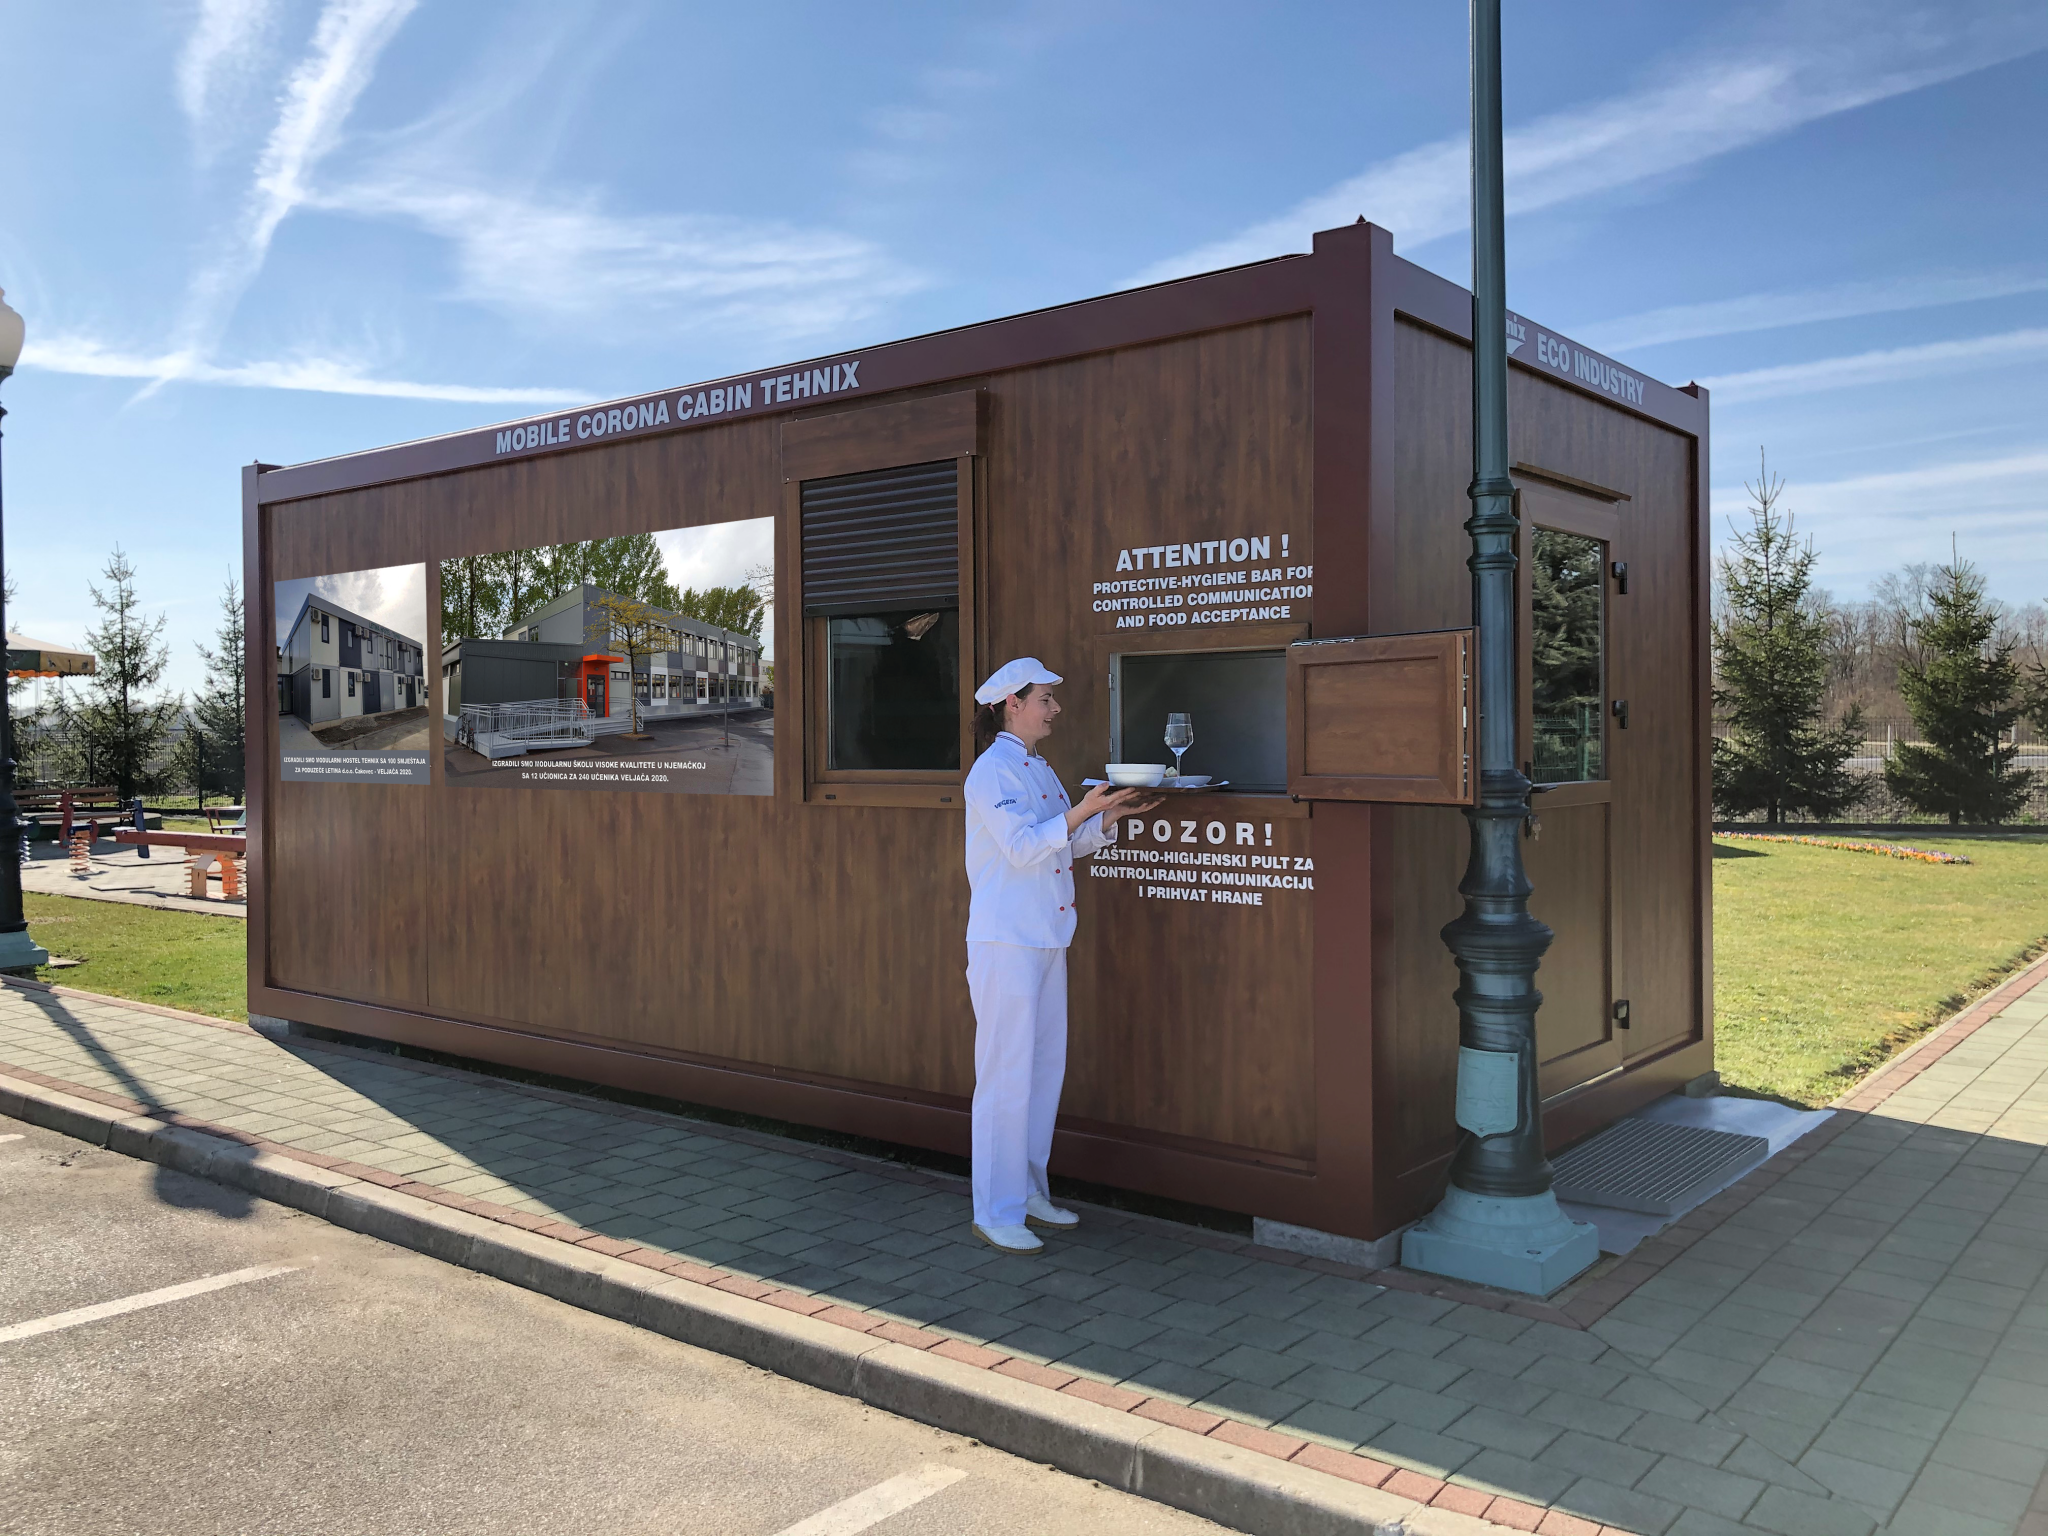 Mobile corona cabin Tehnix for viral deseases